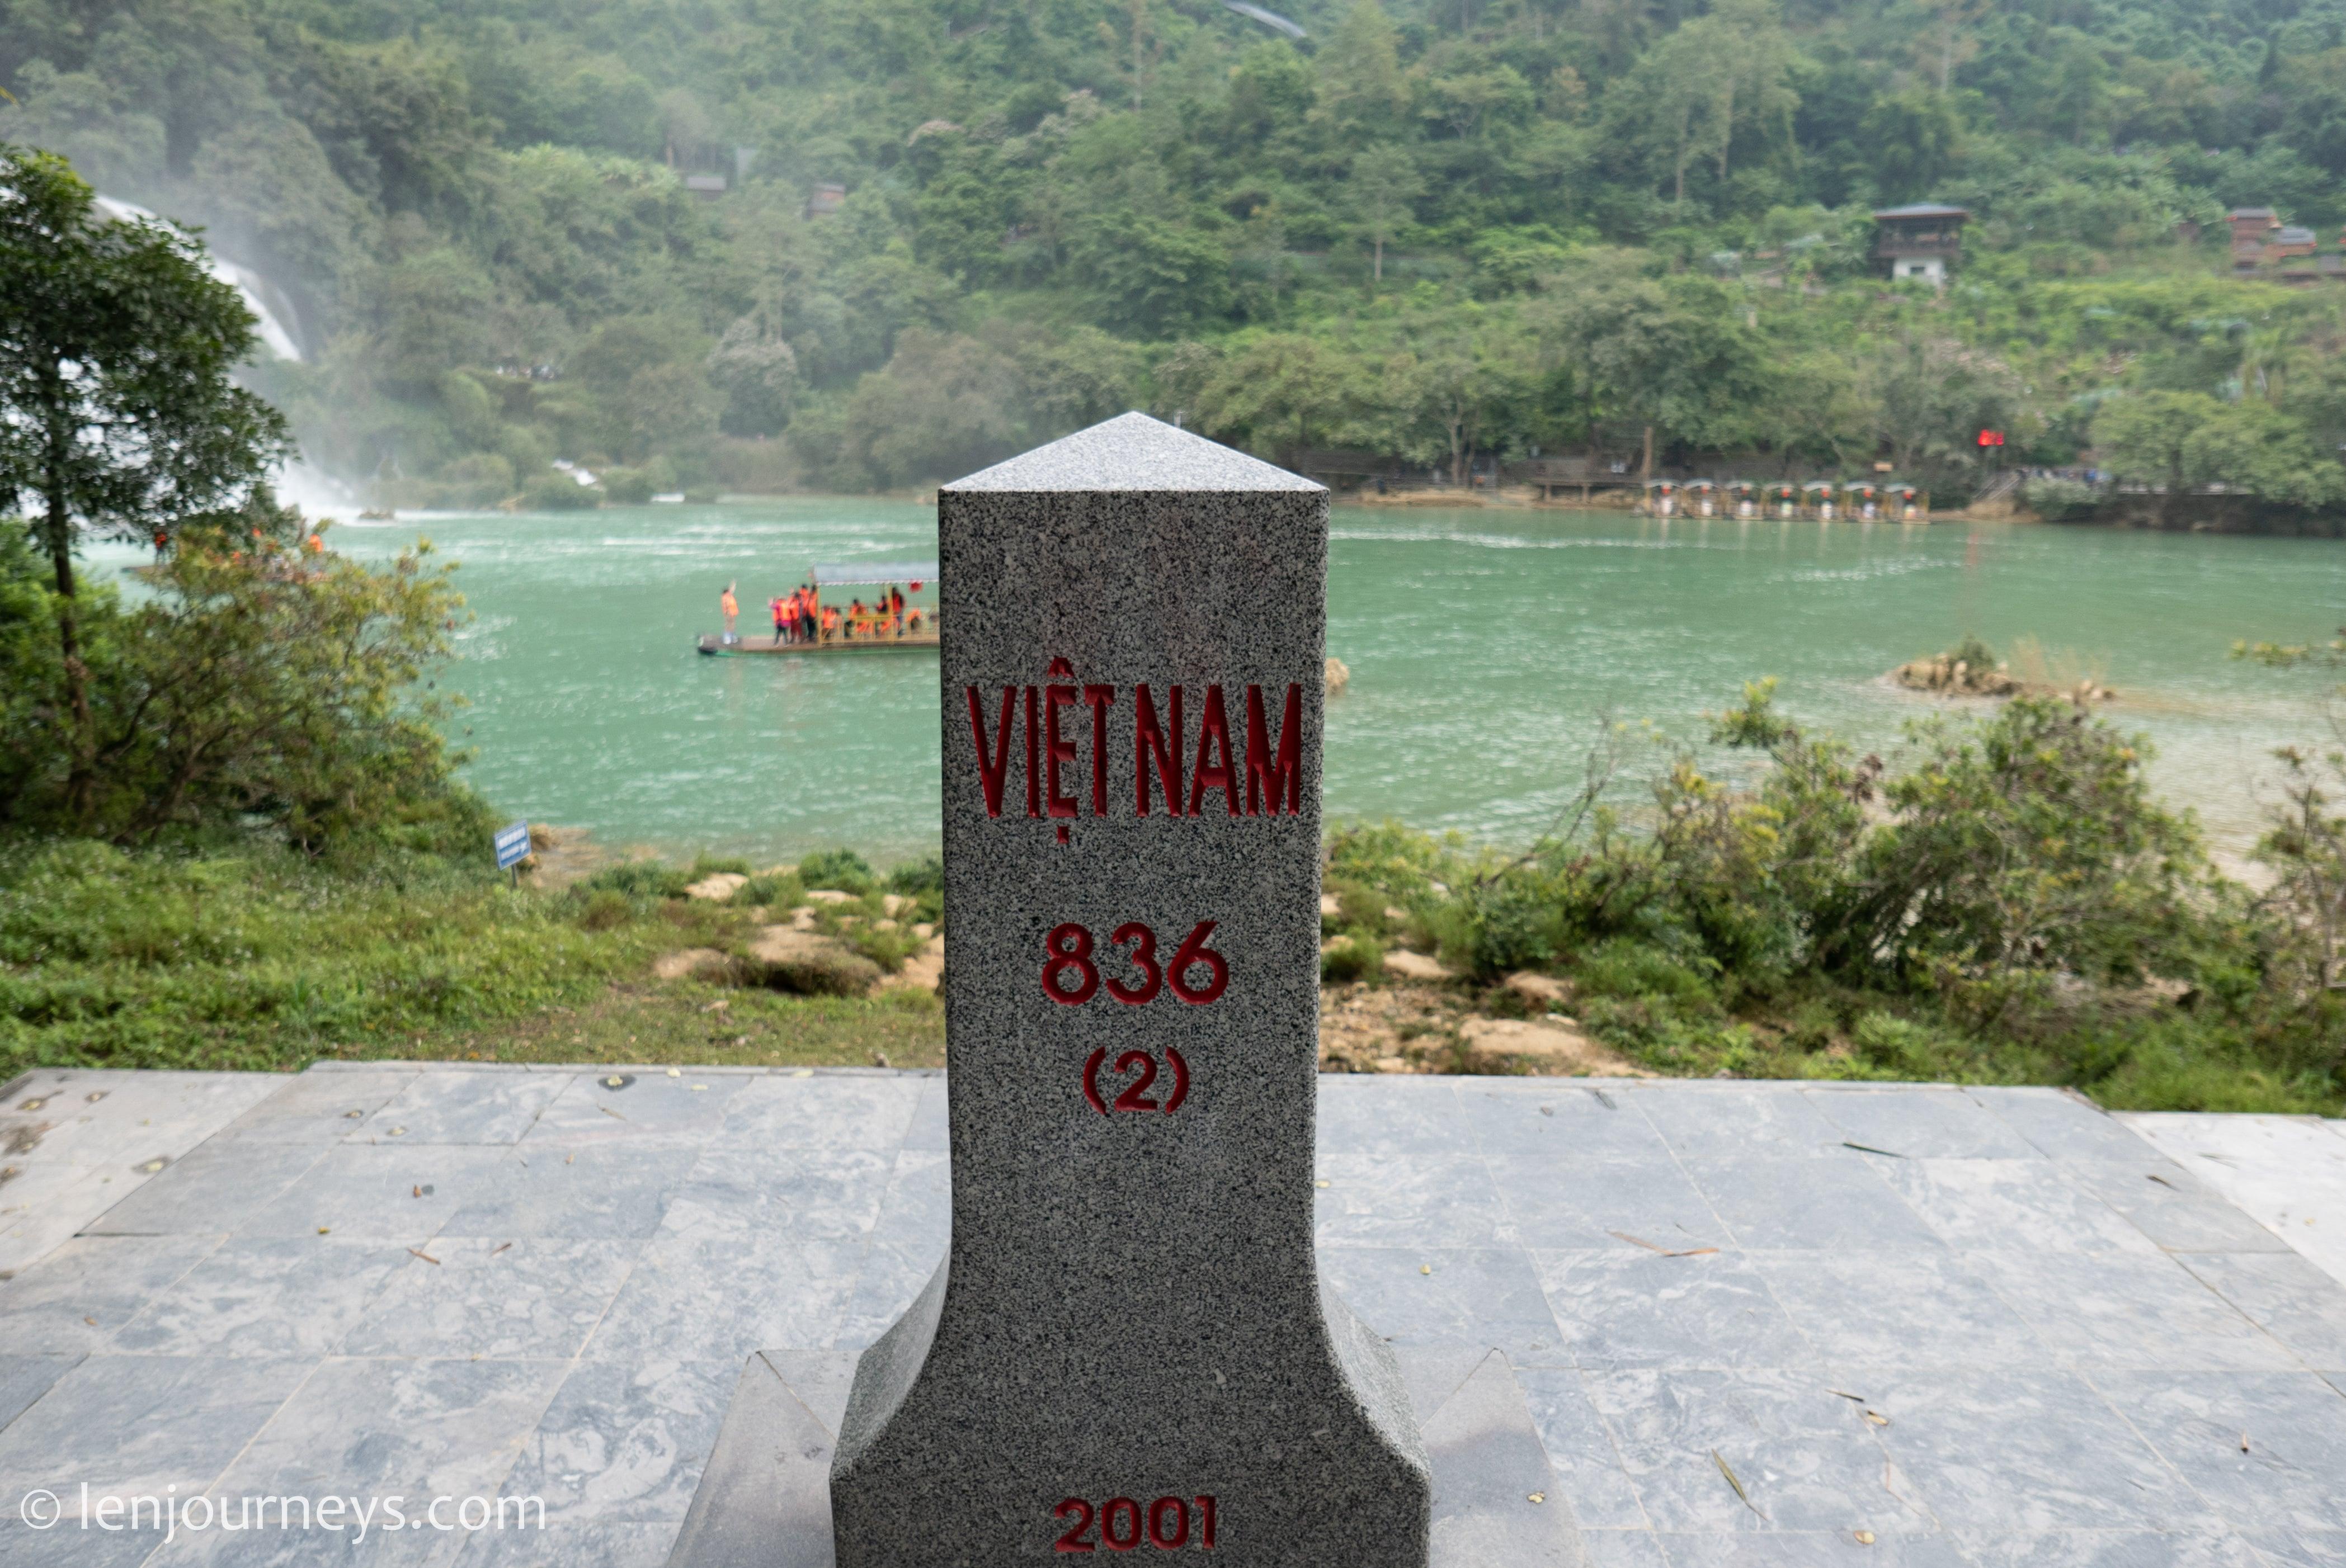 Boundary marker on Vietnamese side